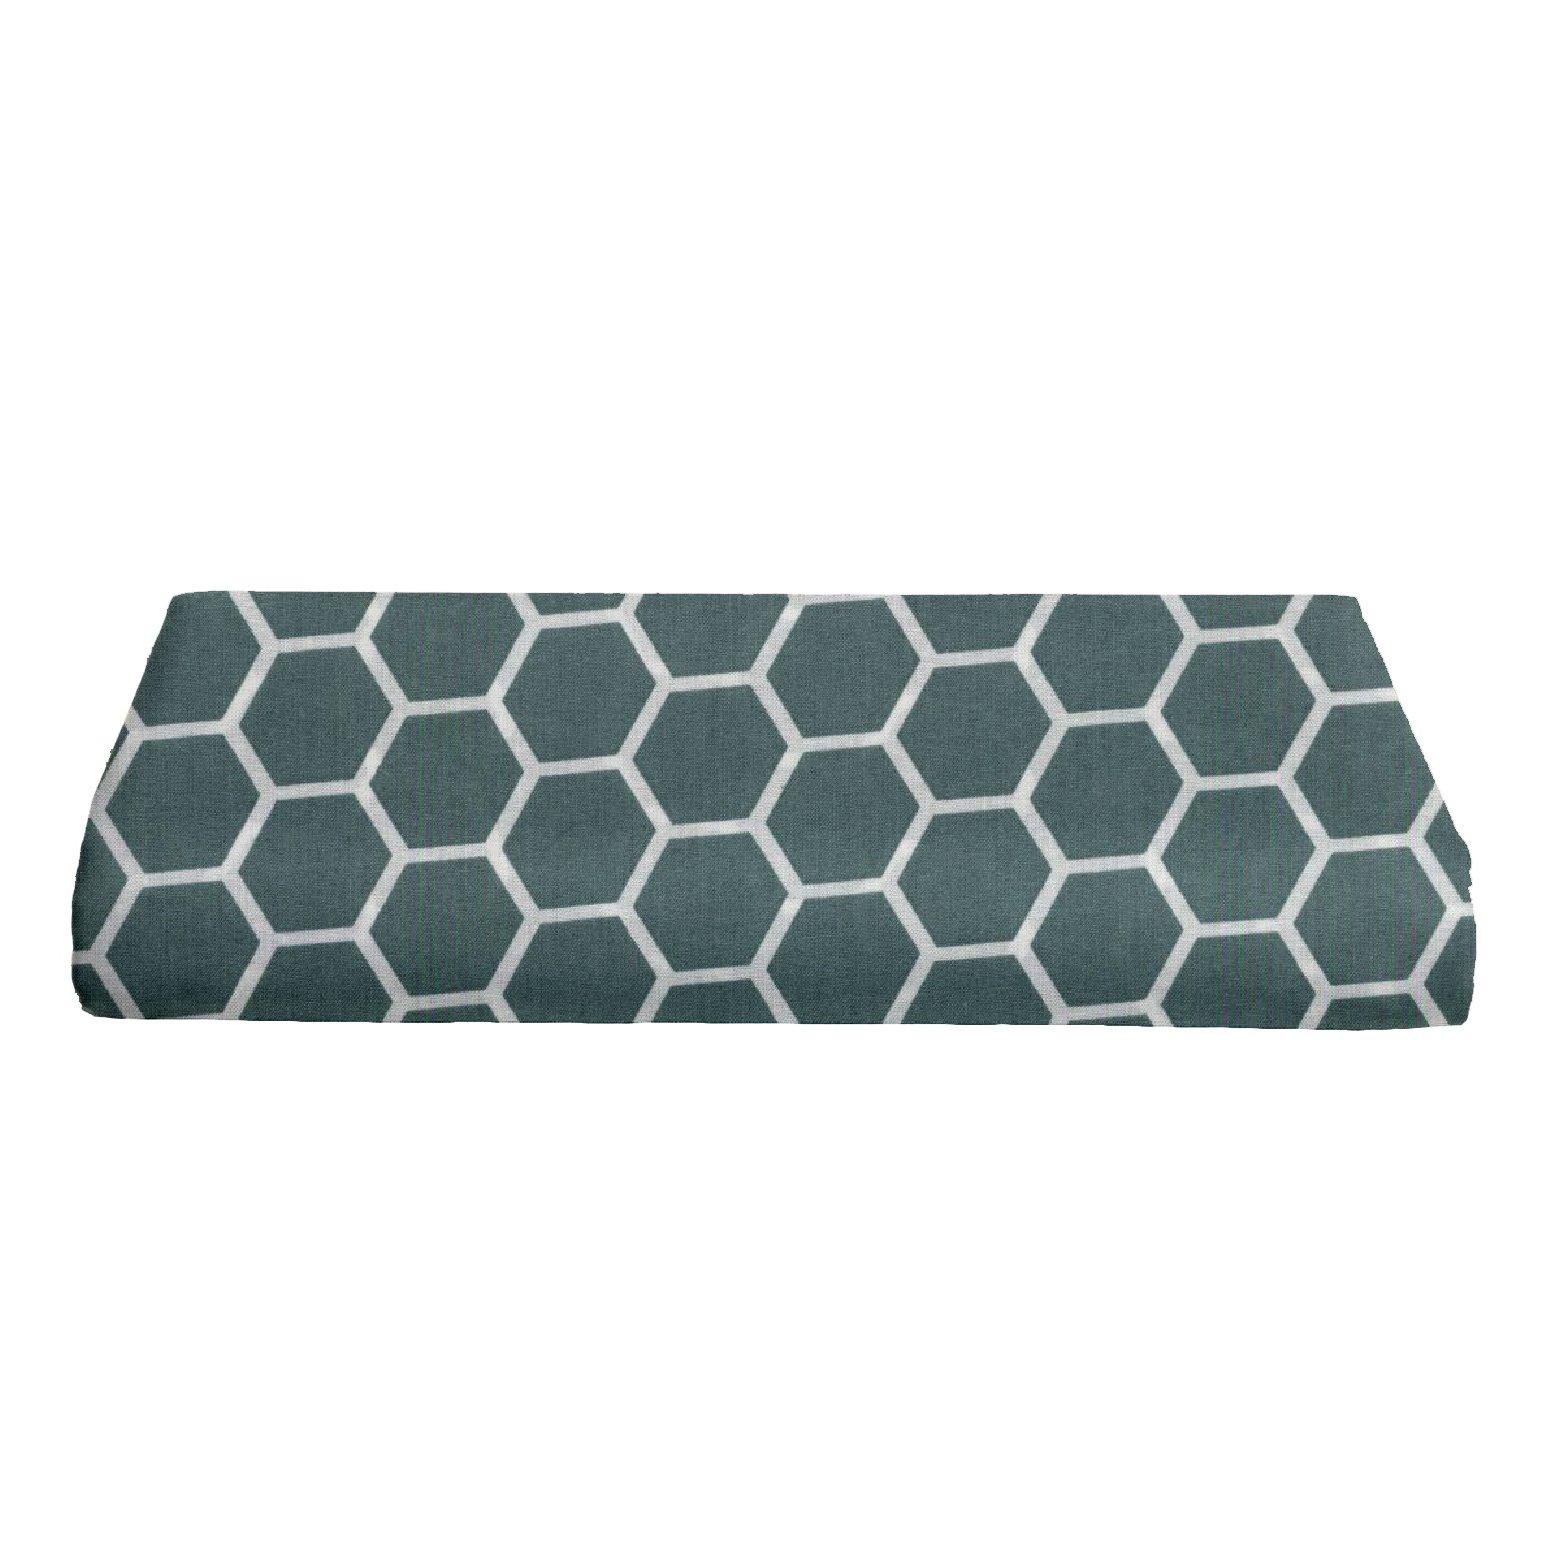 BKB Bassinet Sheet, Honeycomb Spa Blue, 13'' x 29''